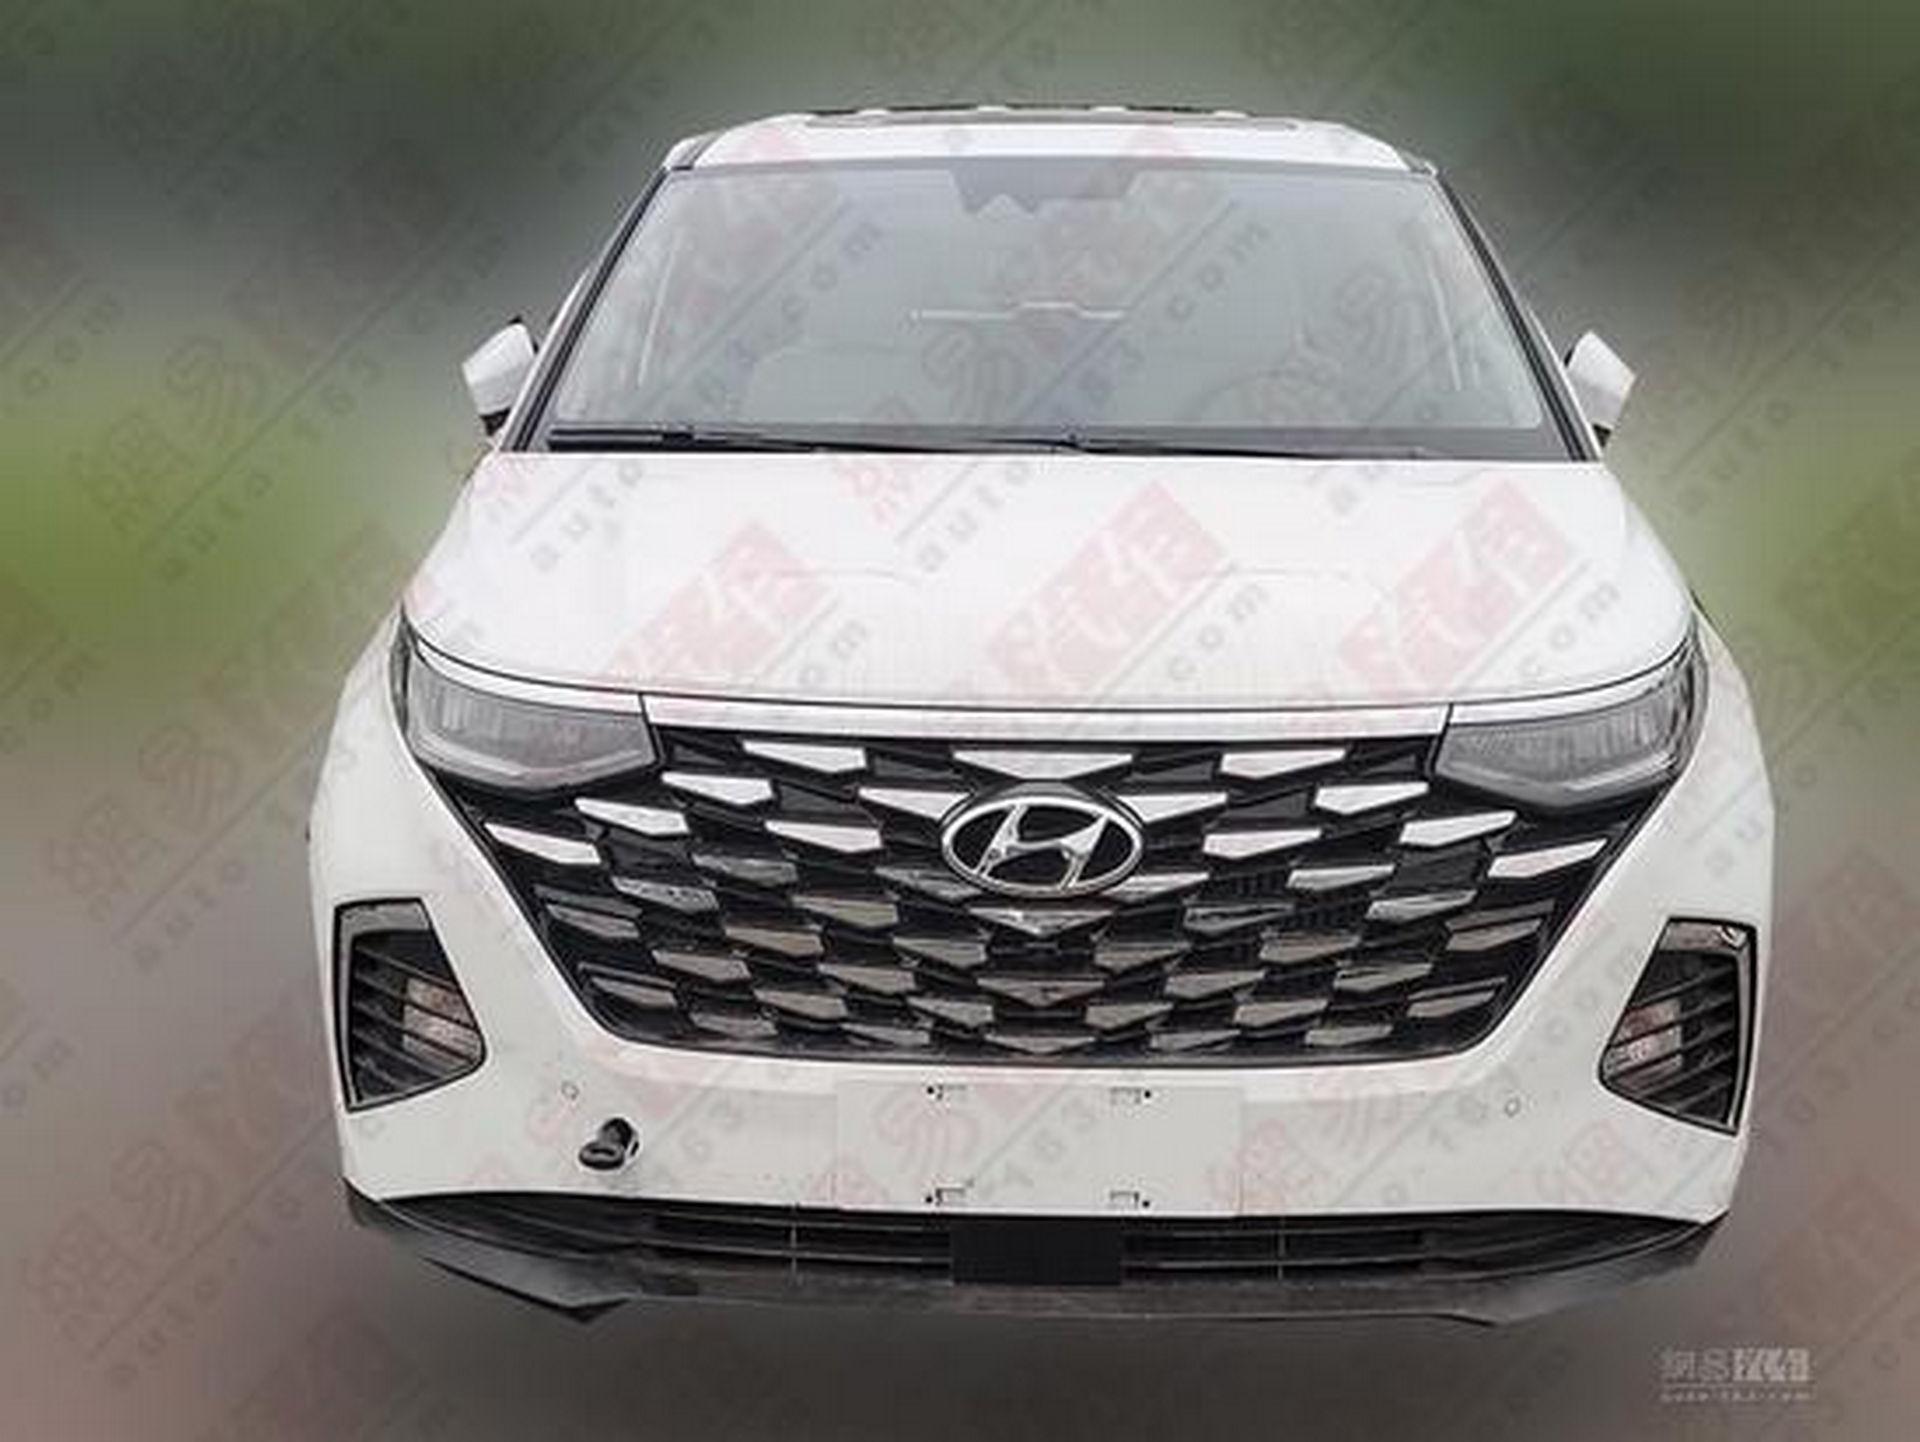 Hyundai_Custo_leaked_0005